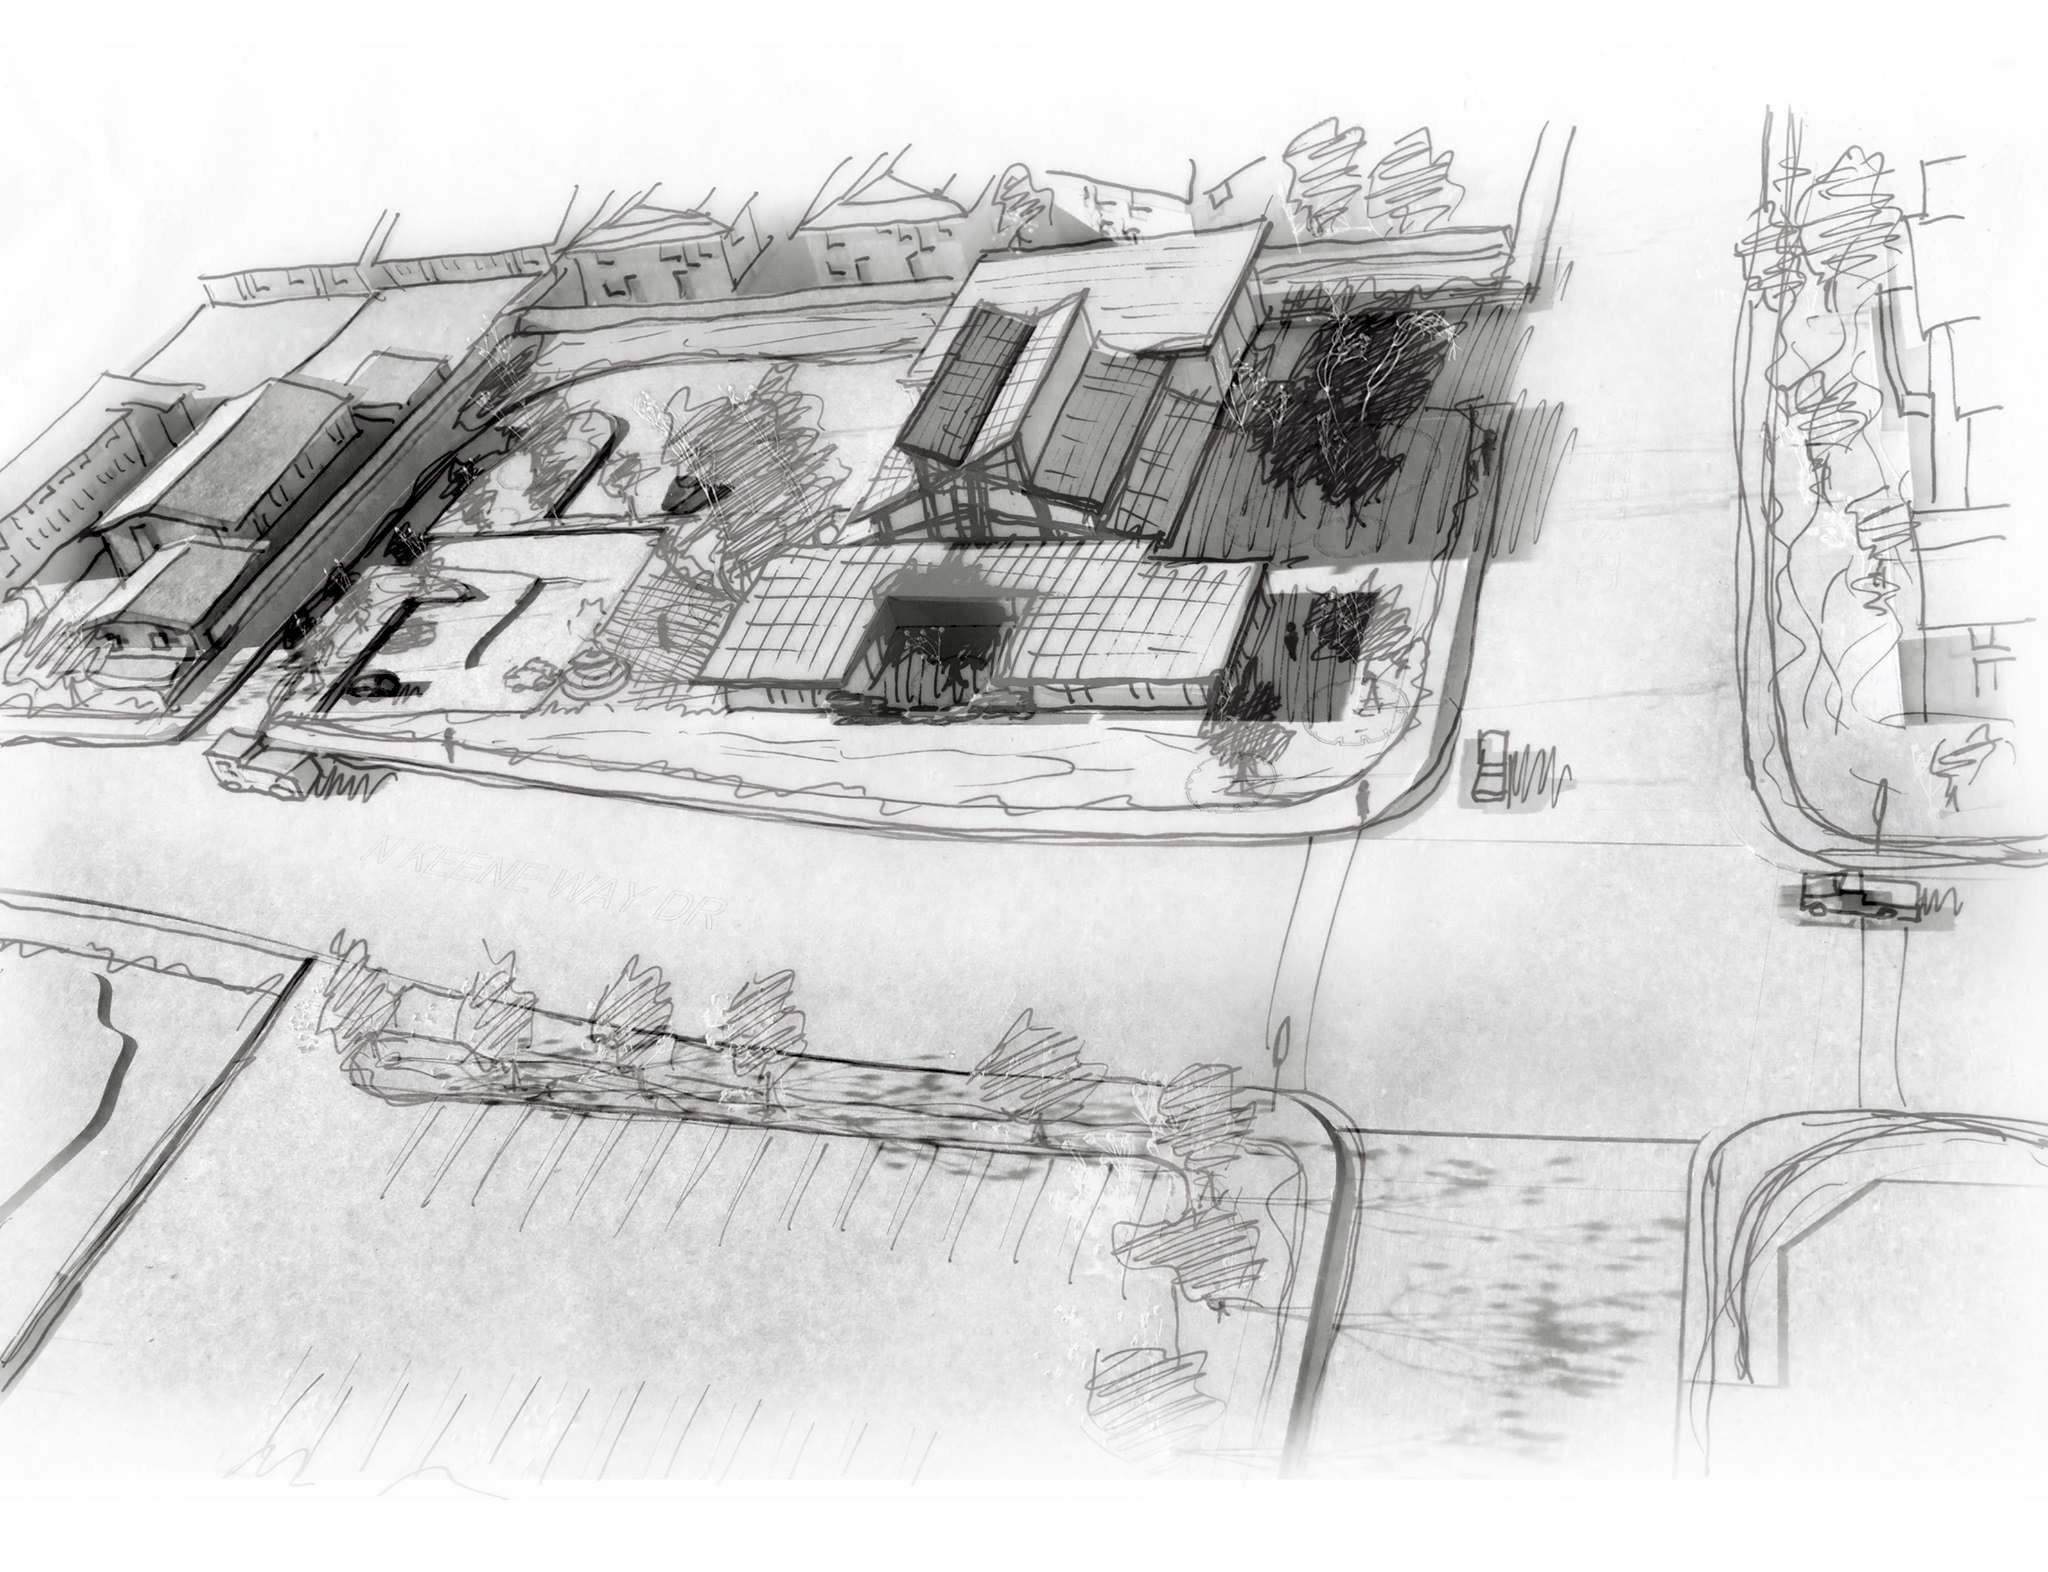 Axon Sketch